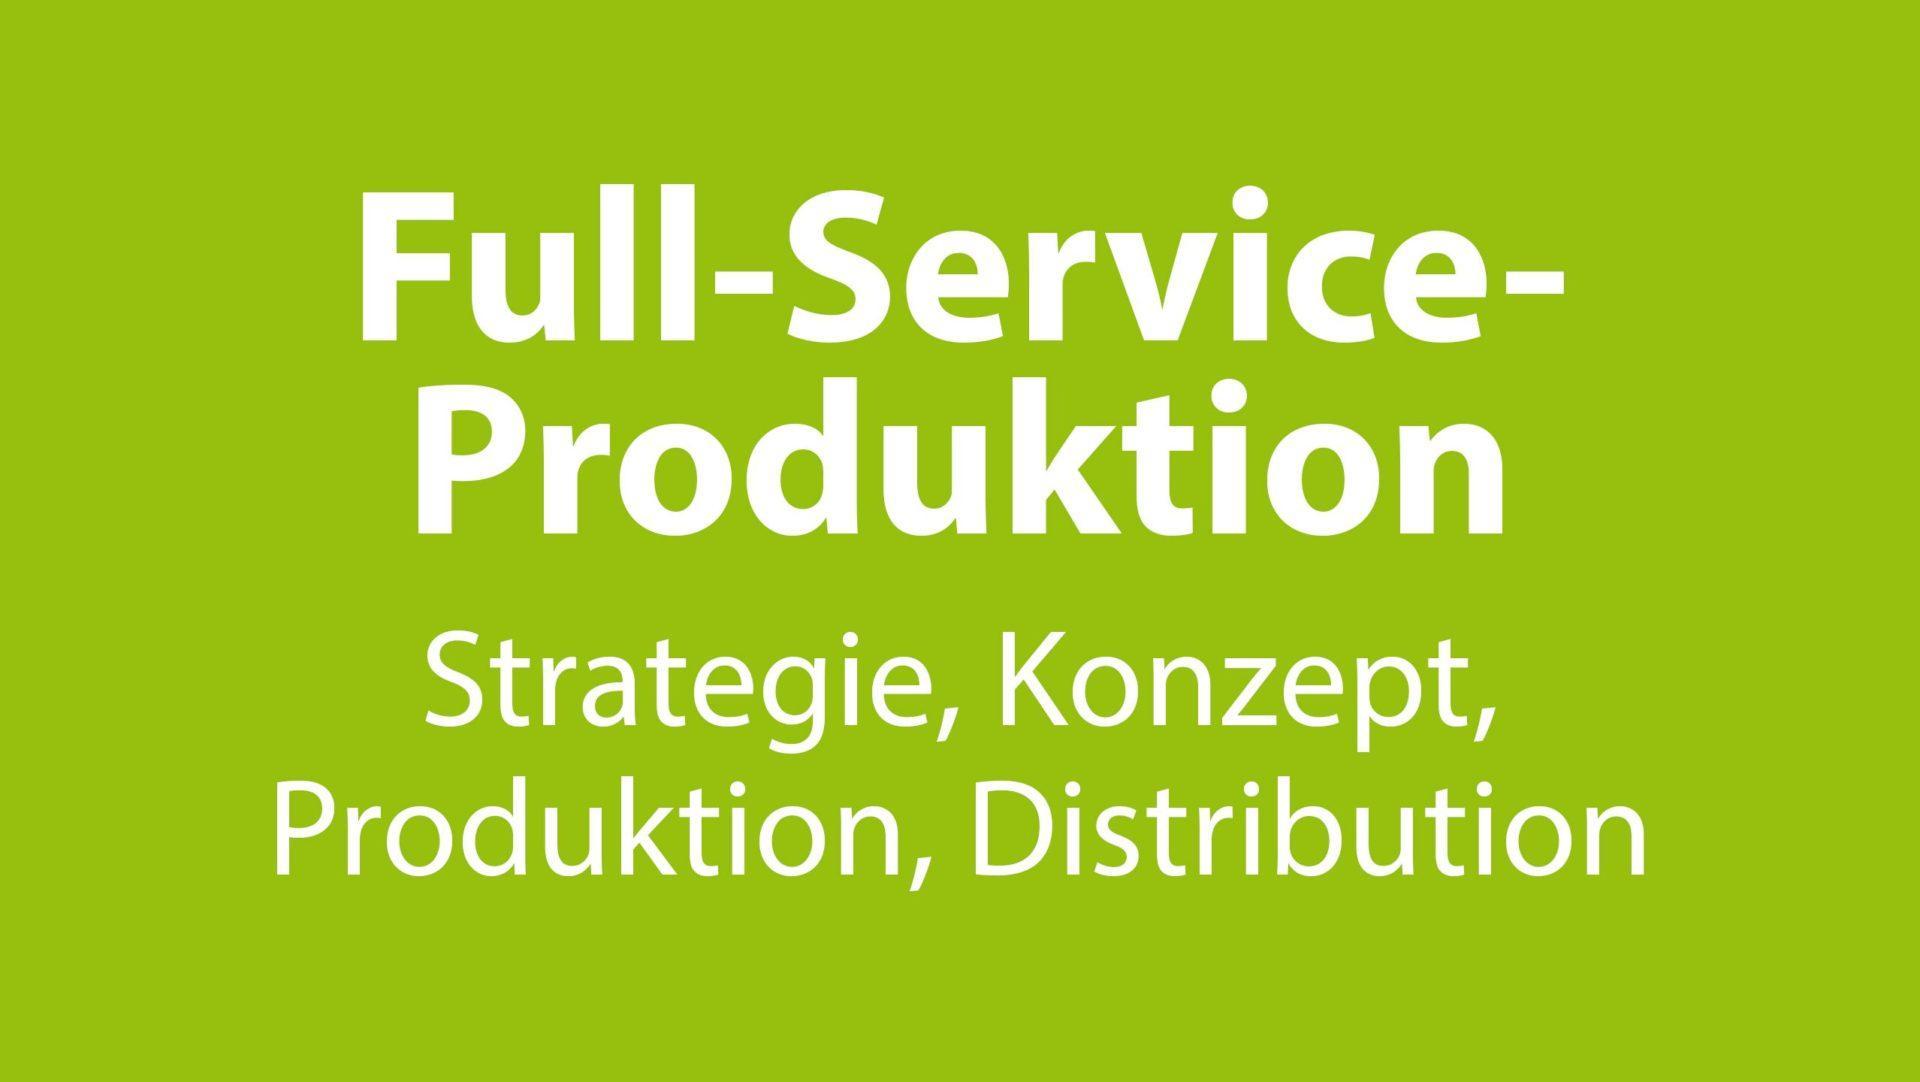 Full-Service-Produktion